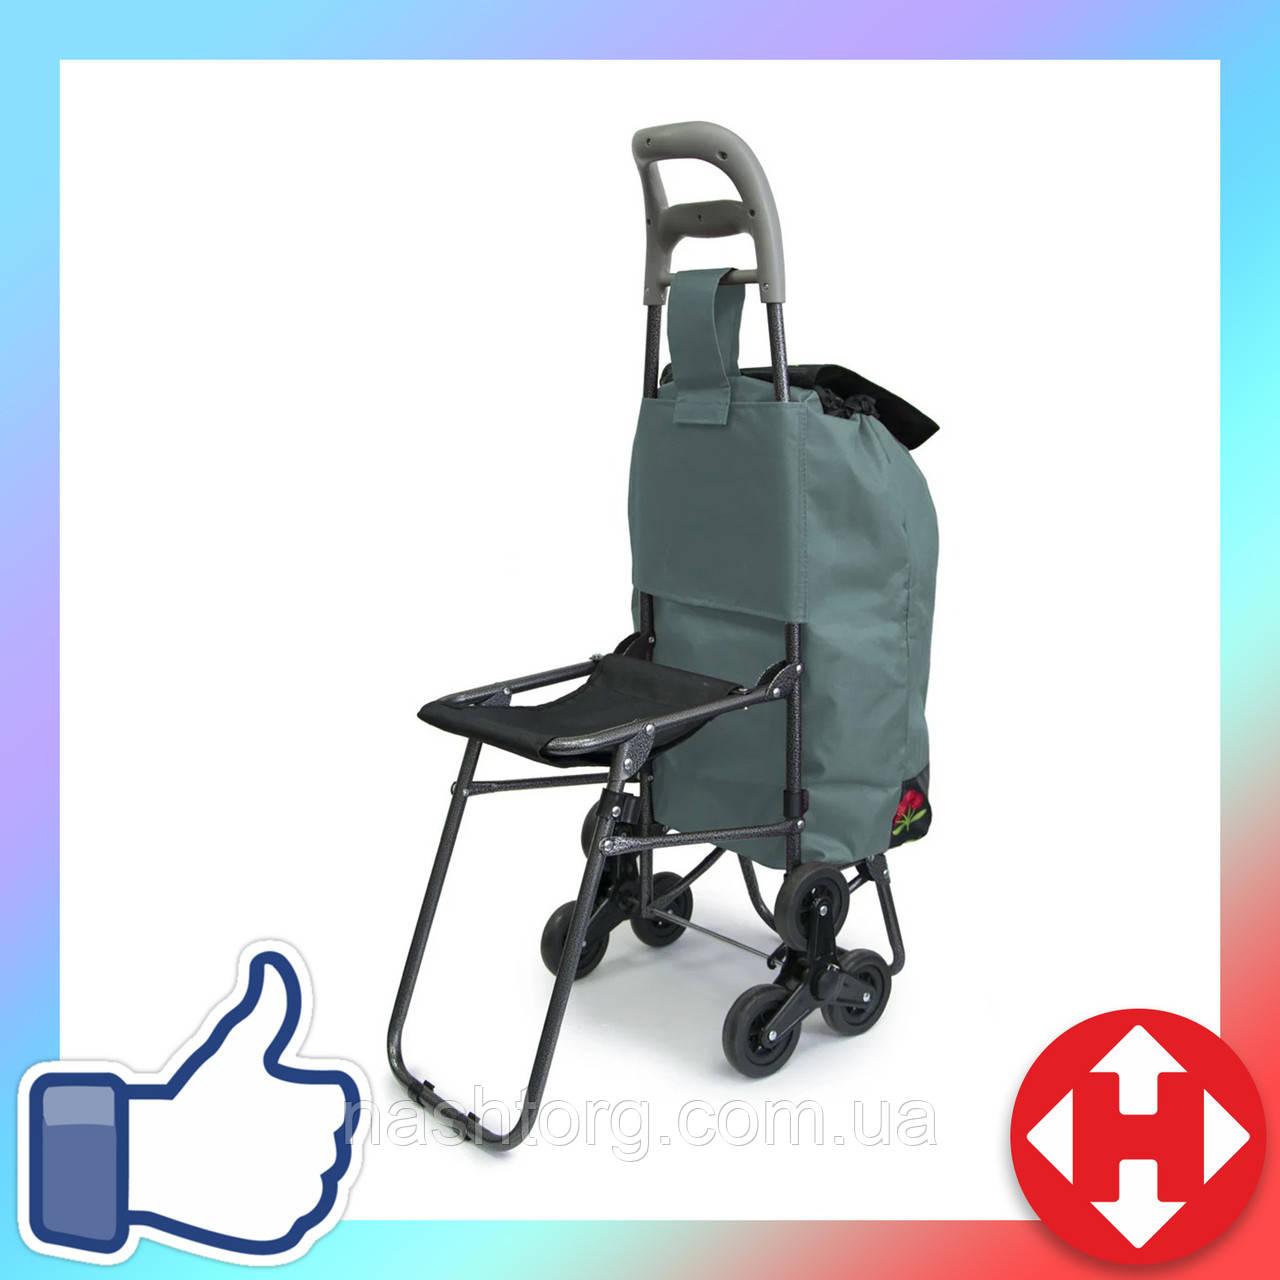 Хозяйственная тележка для продуктов - ручная тачка на колесиках, Цвет №22 кравчучка с сумкой